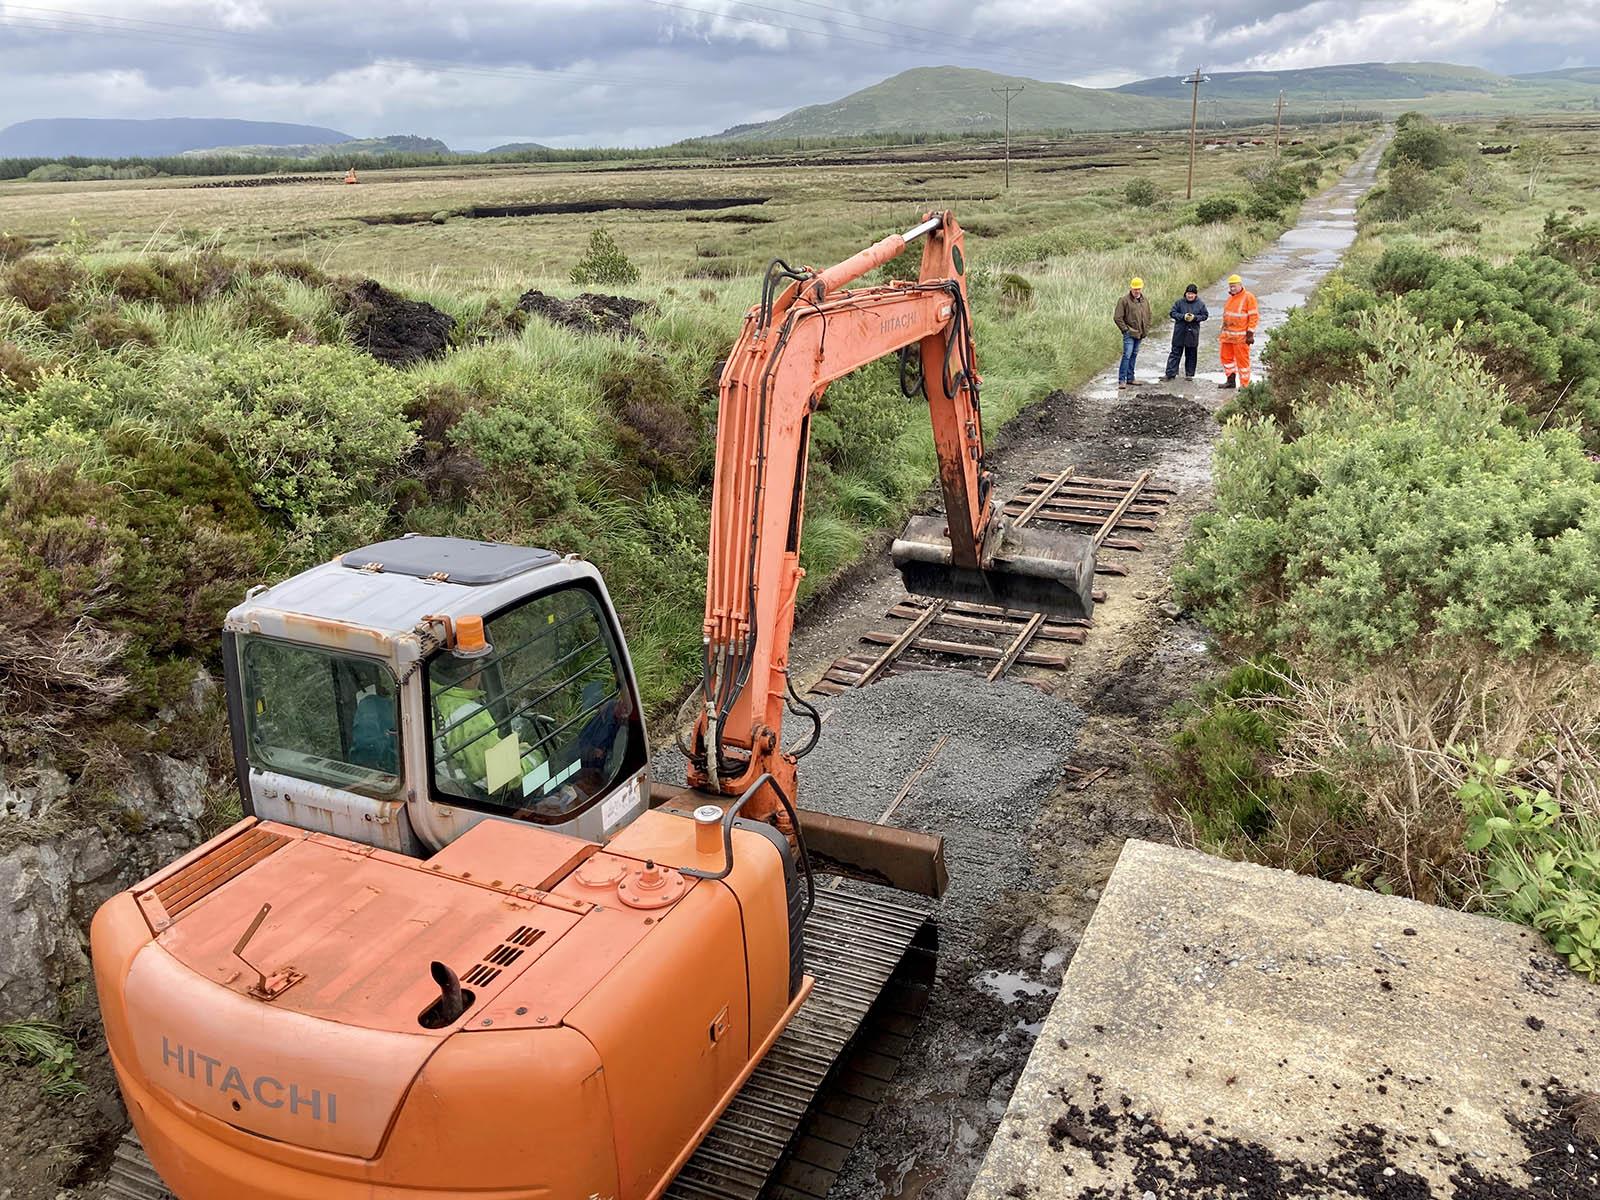 The excavator spreads some fine ballast